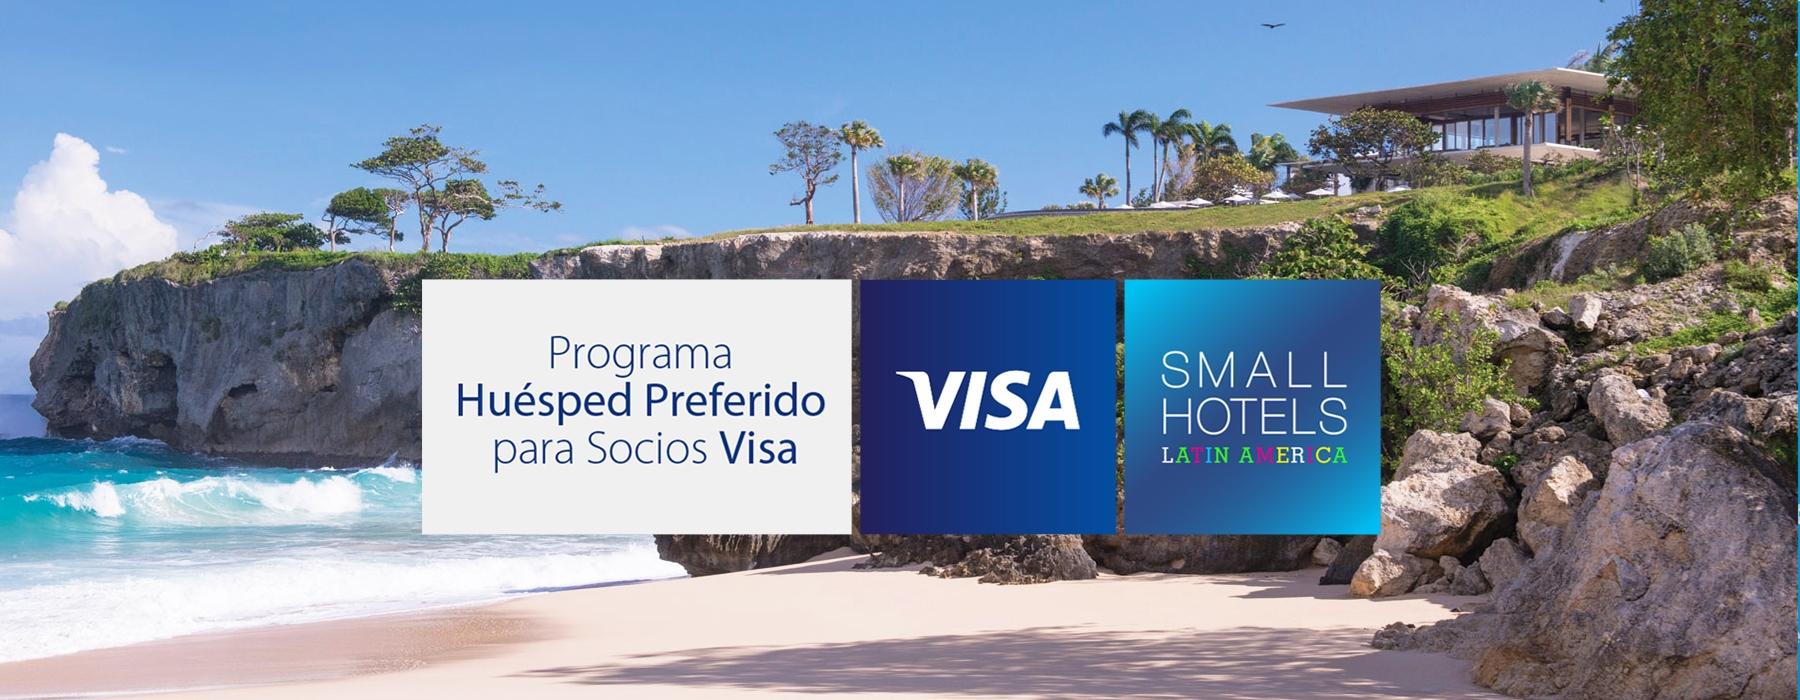 Small Hotels Latin America